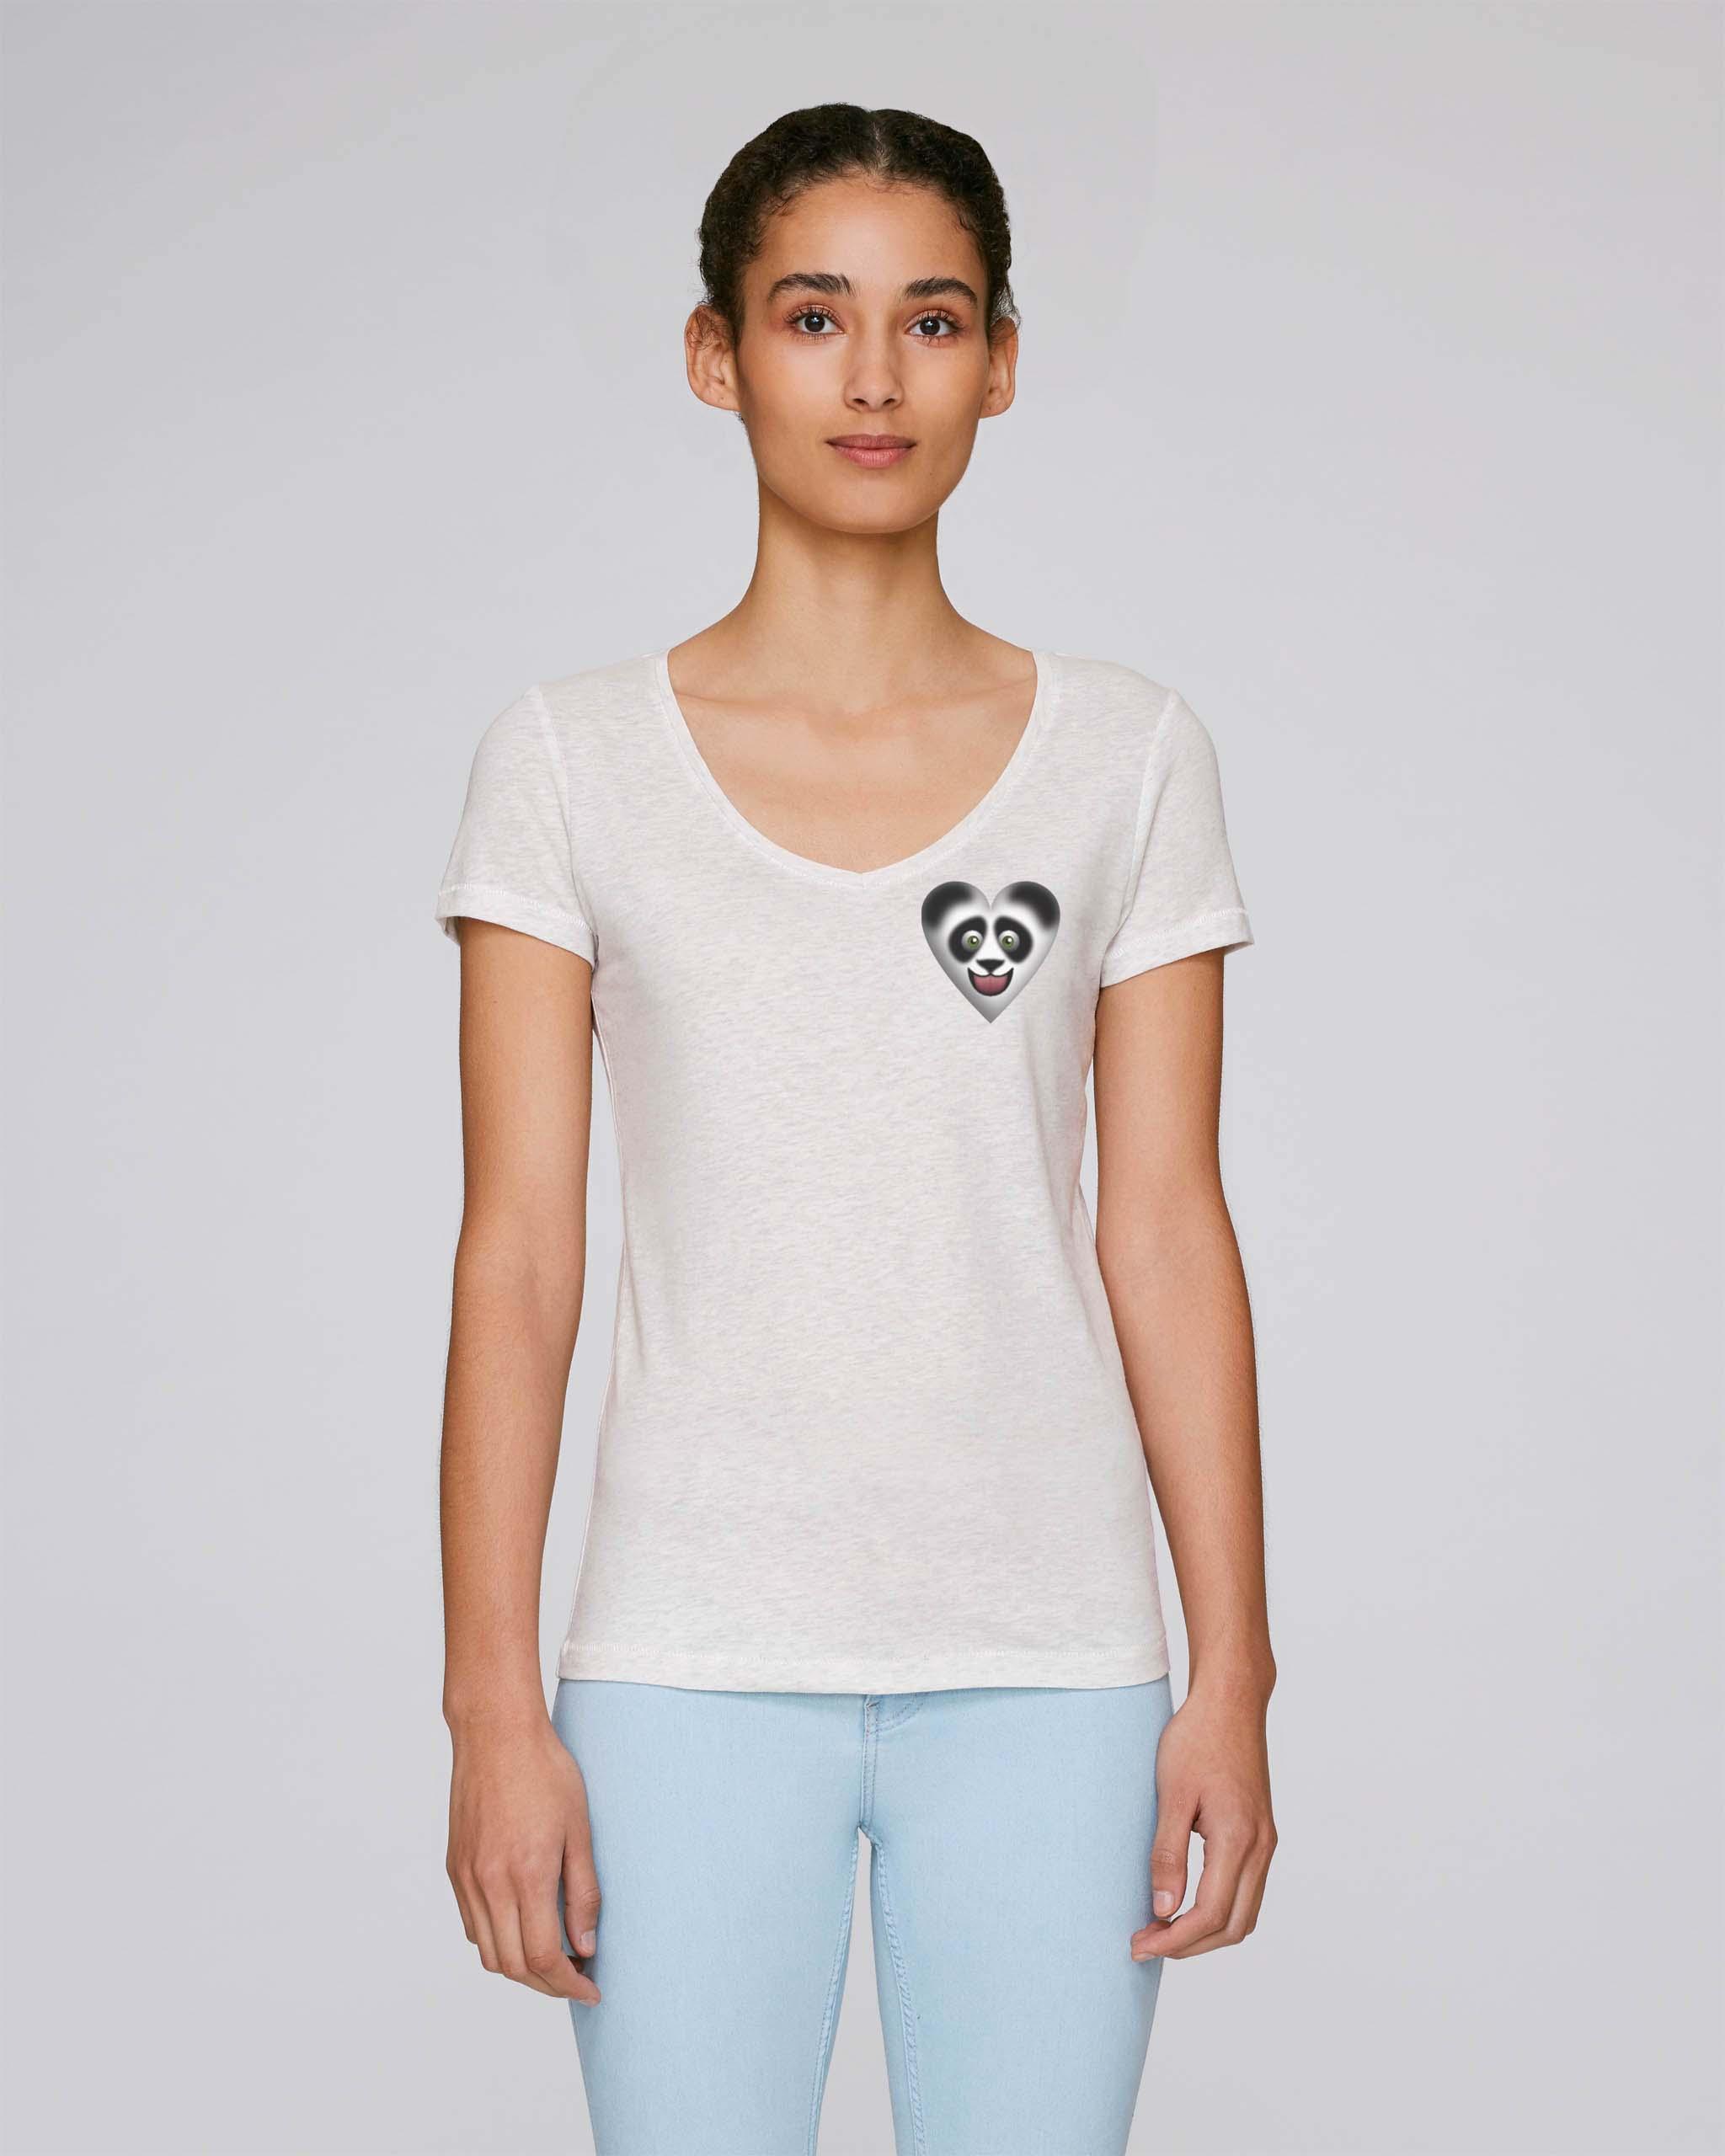 T-Shirt Bio blanc Femme – Panda tee